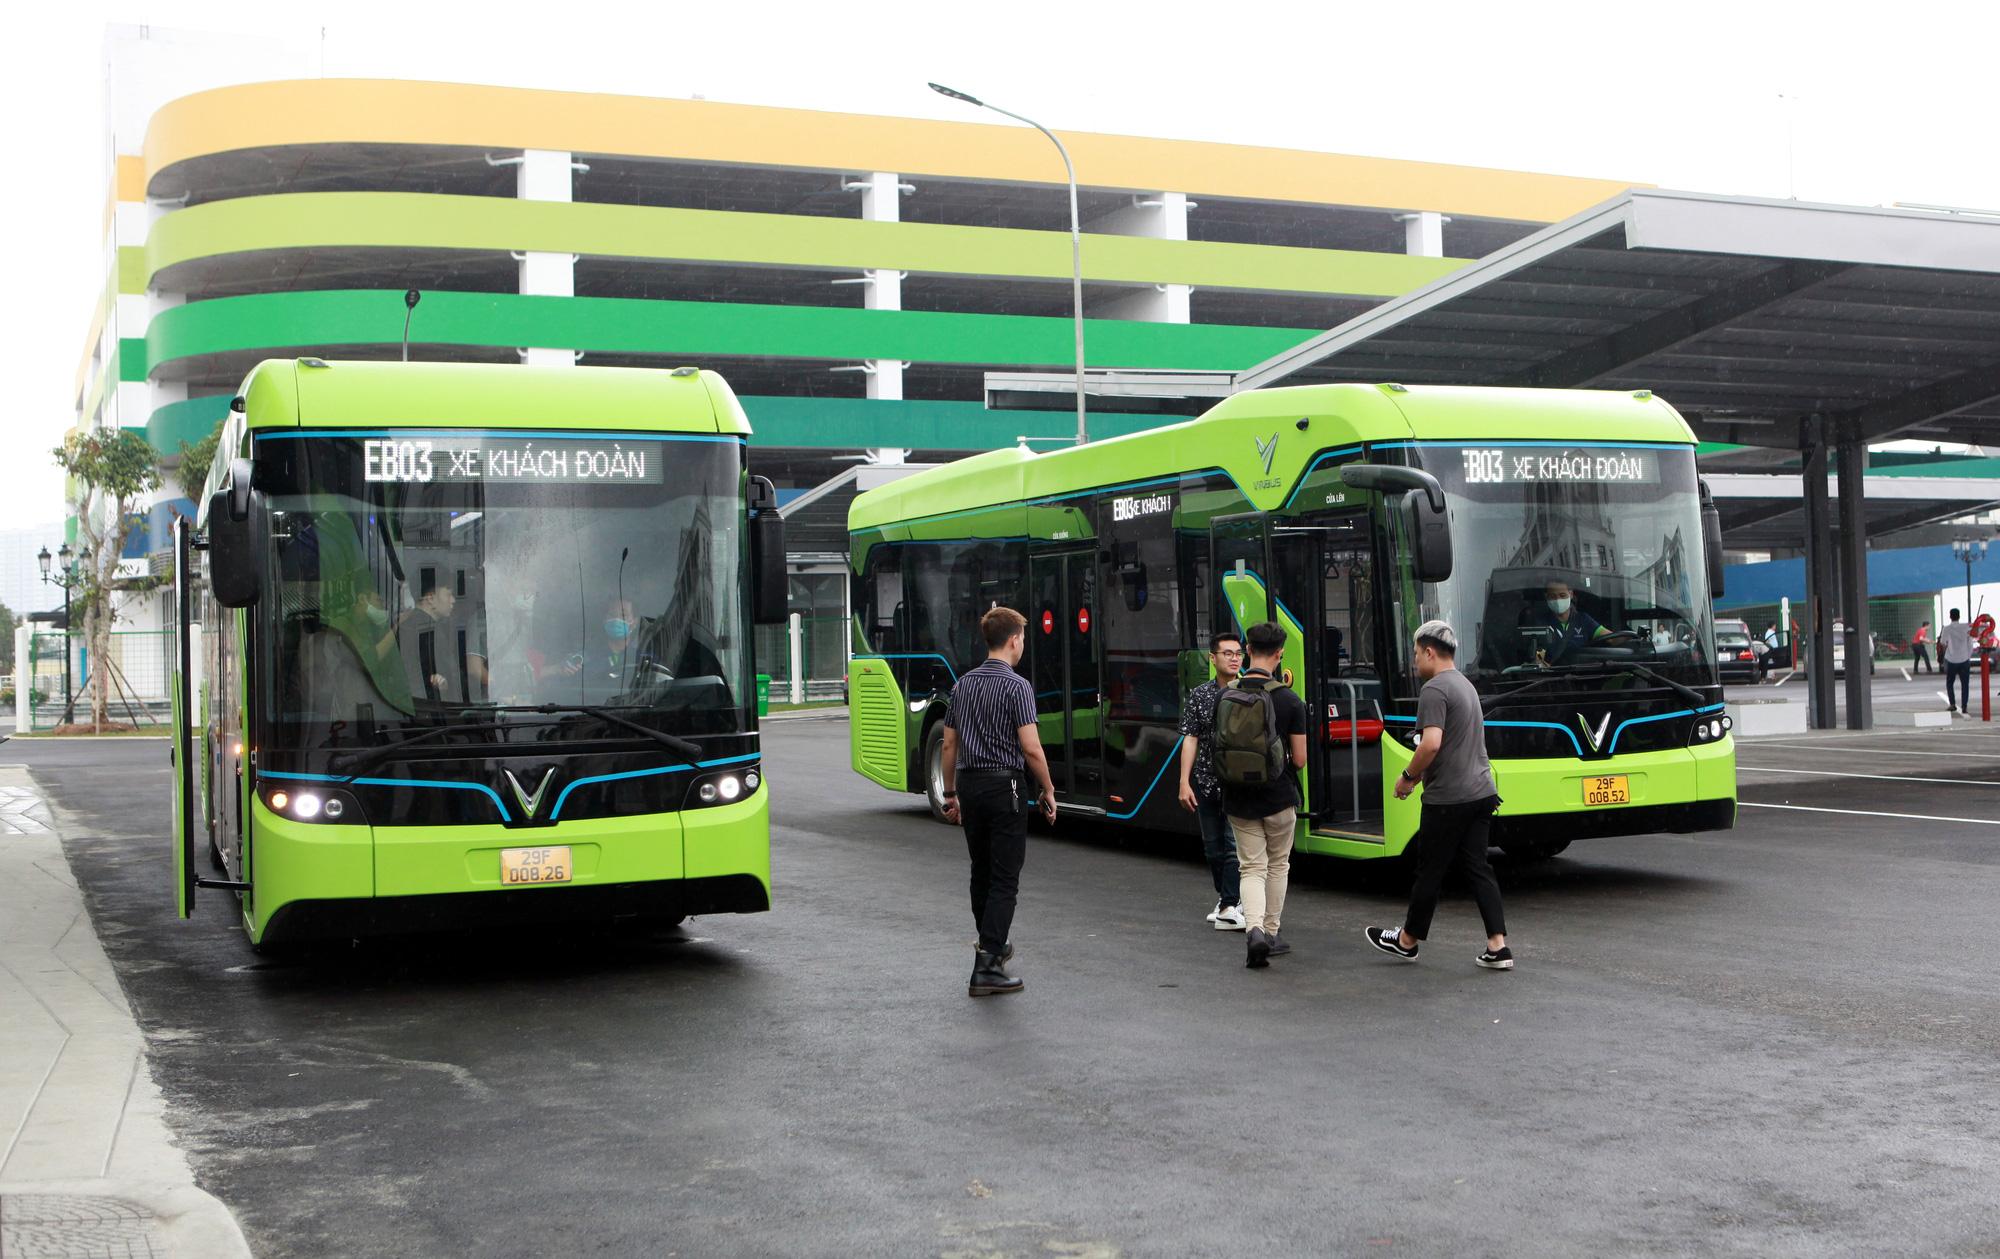 VinBus smart e-bus service is launched at Vinhomes Ocean Park urban area in Gia Lam District, Hanoi, April 8, 2021. Photo: Tuan Phung / Tuoi Tre